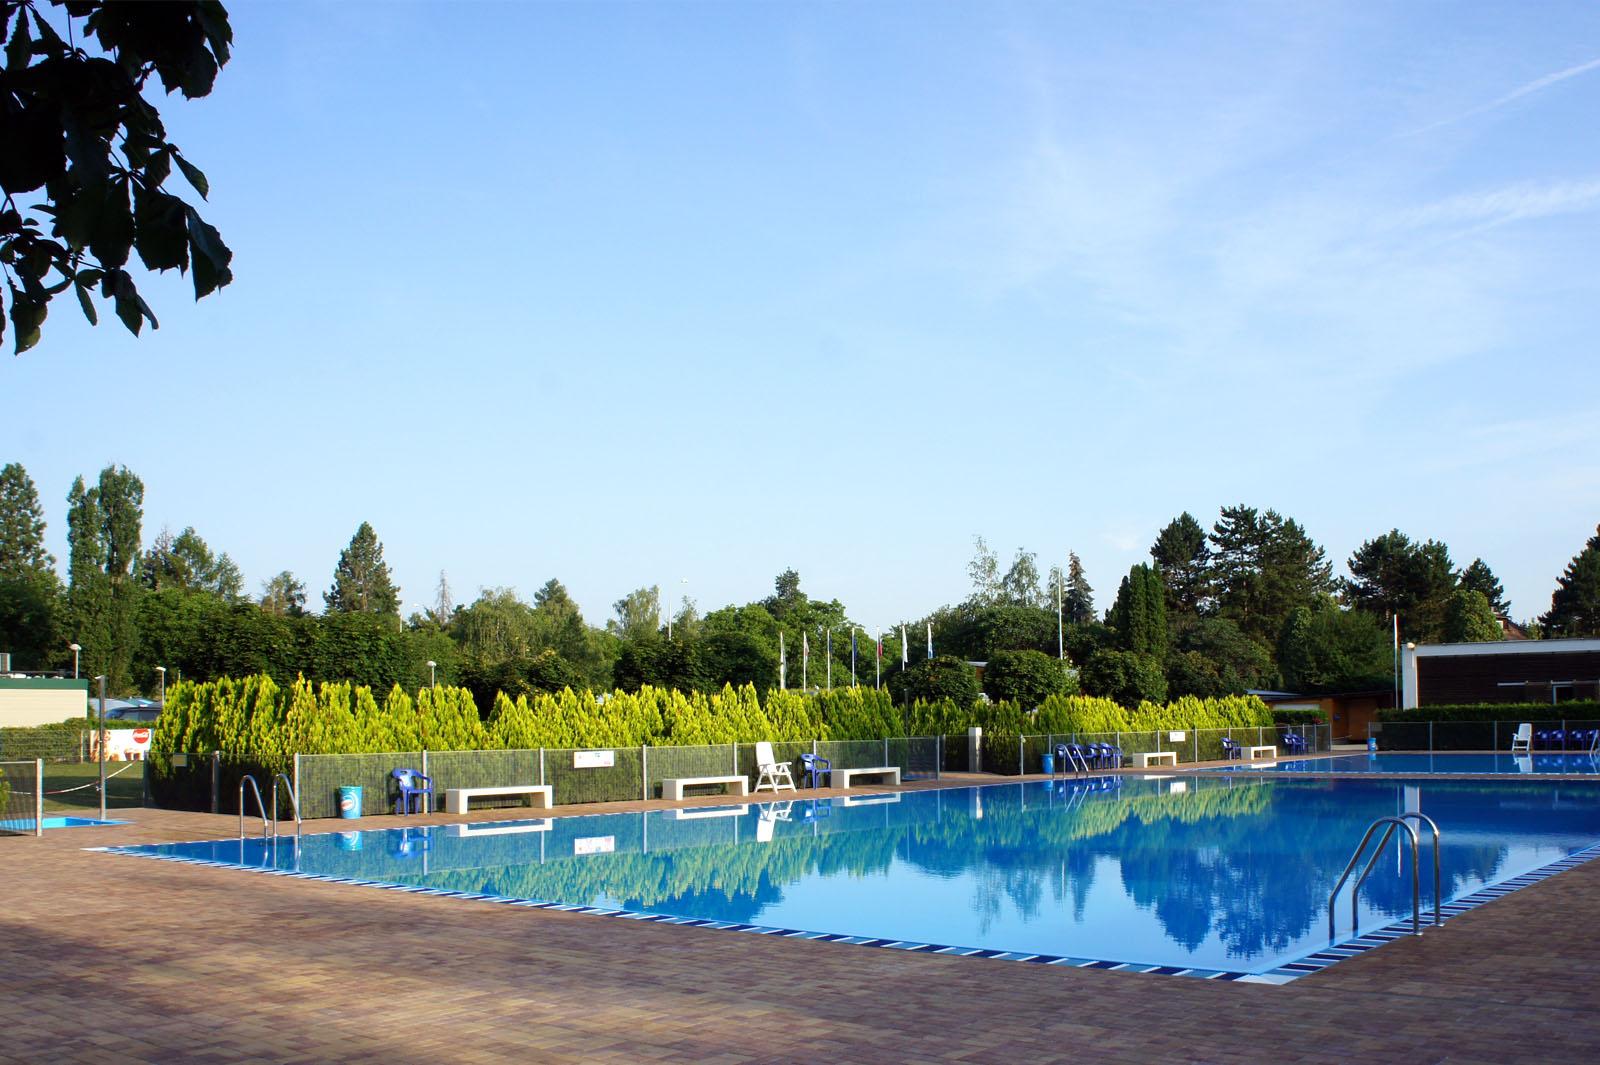 Camping Praha Klánovice - Swimming Pools